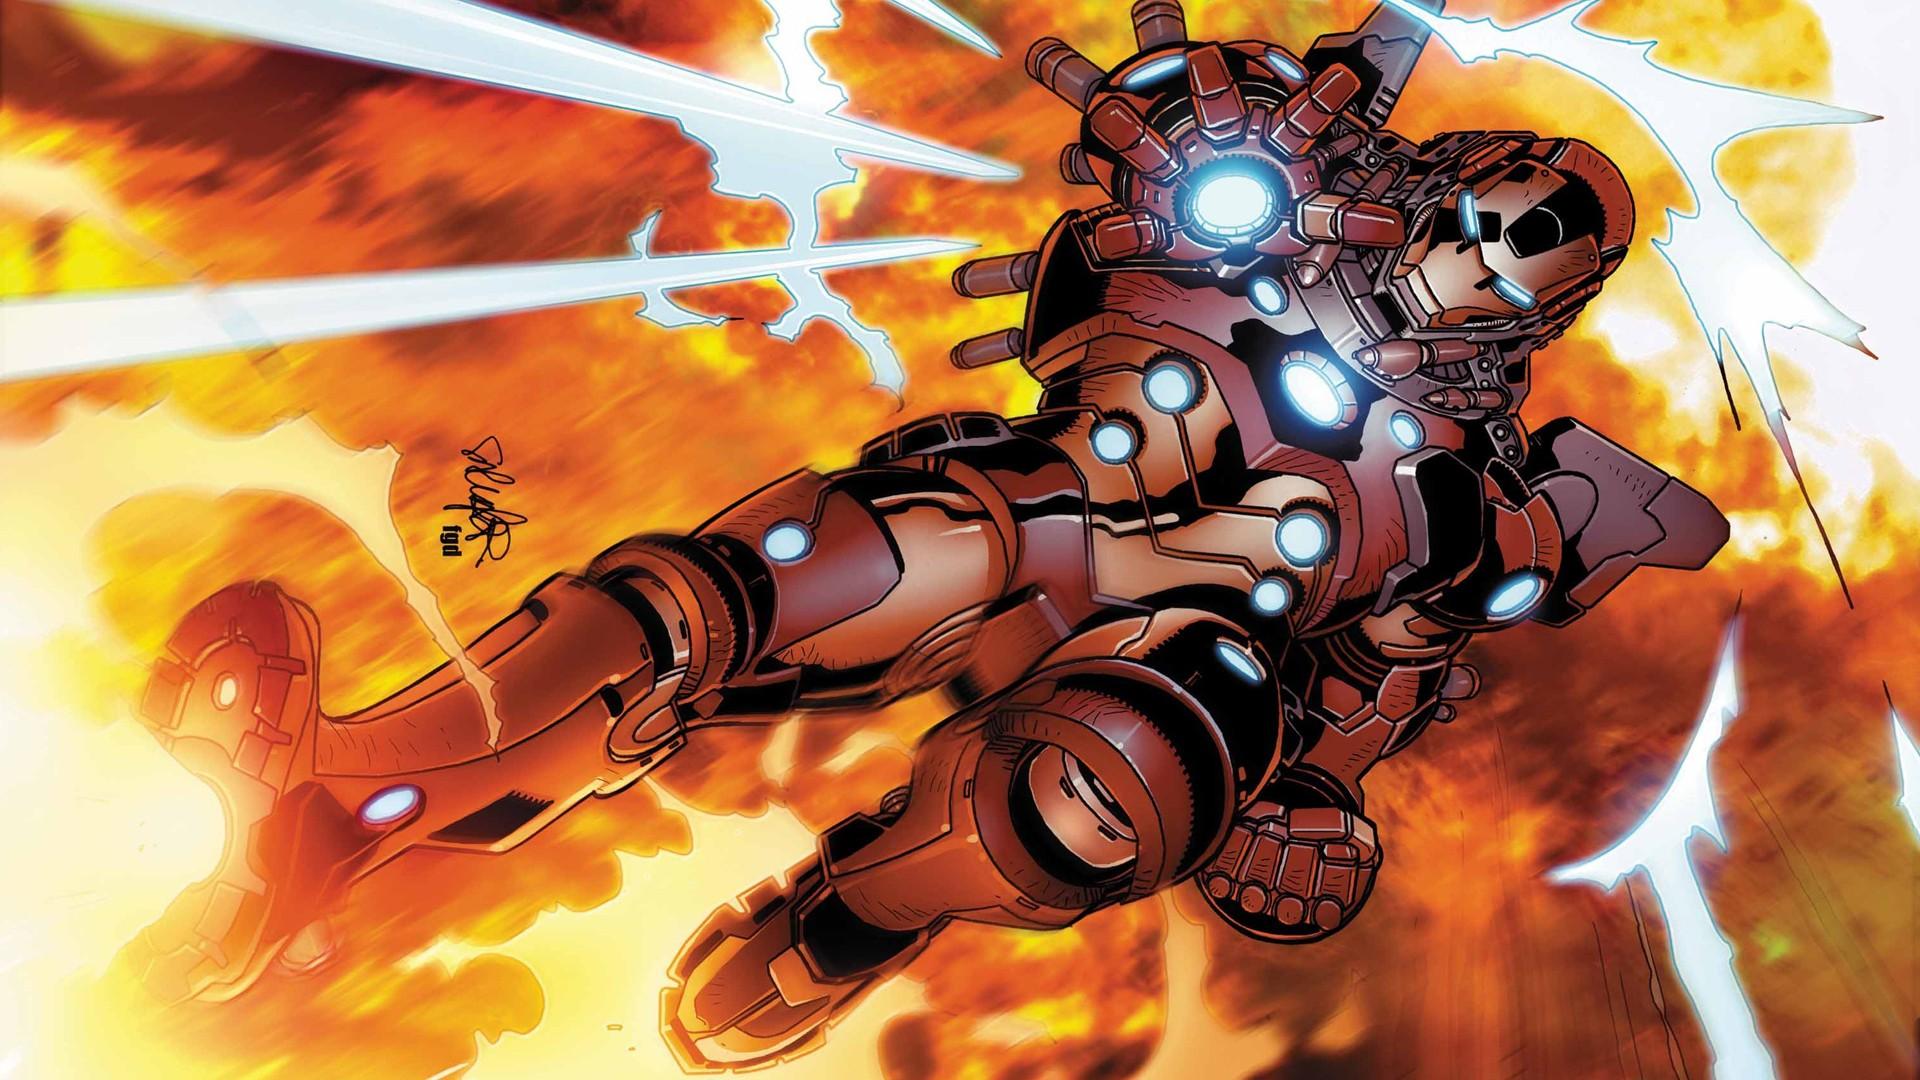 Iron Man Comic Wallpapers High Quality - Wickedsa com